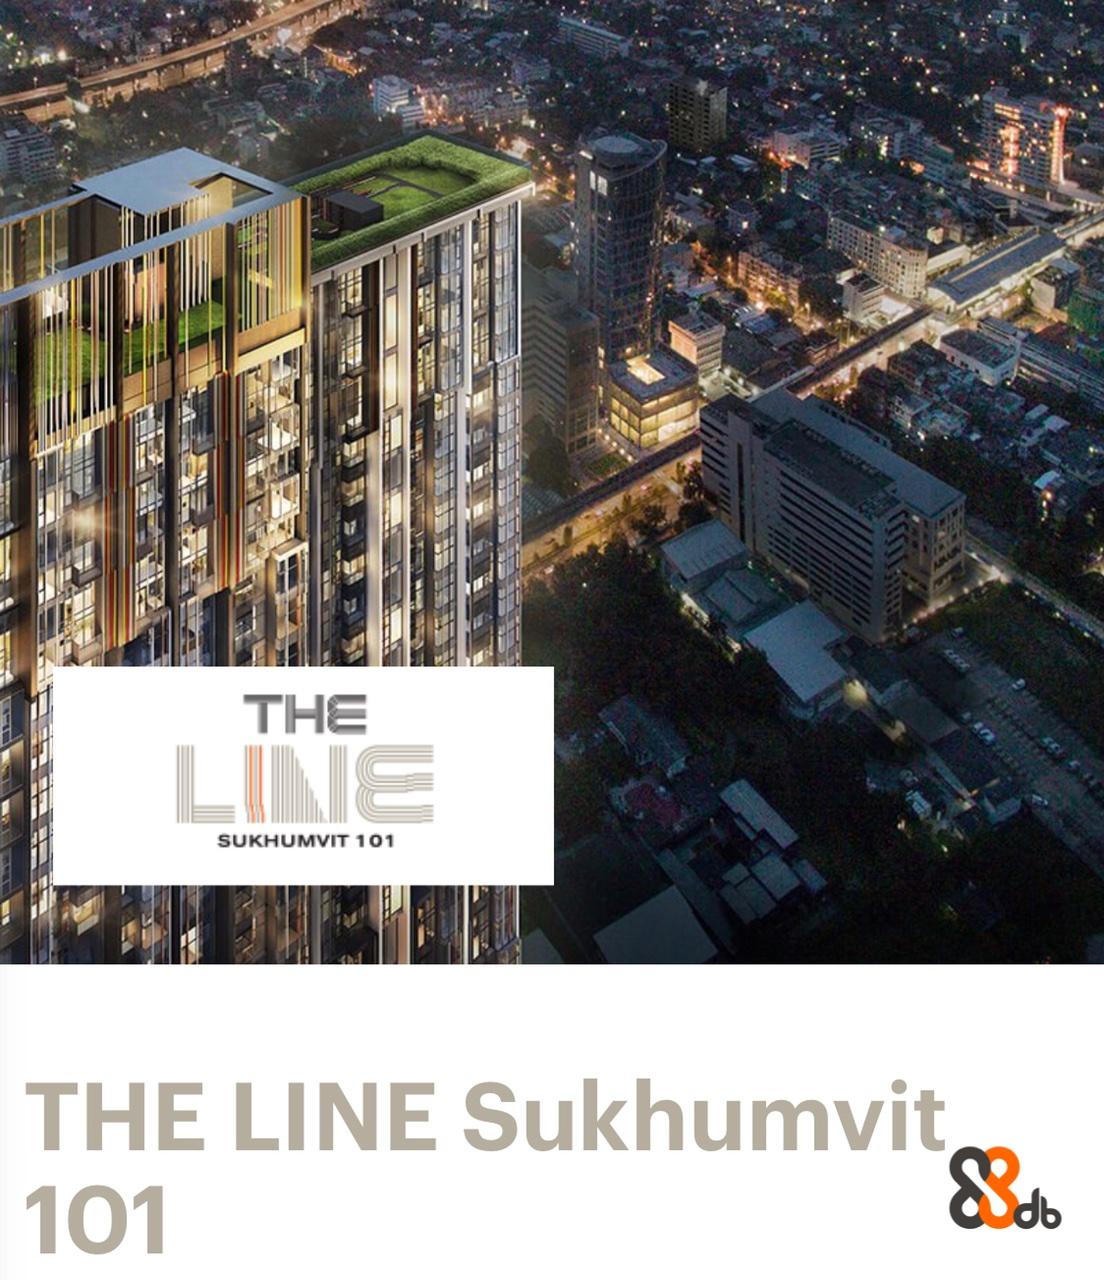 THE LINE SUKHUMVIT 101 THE LINE Sukhumvit, 101  Property,City,Architecture,Condominium,Urban area